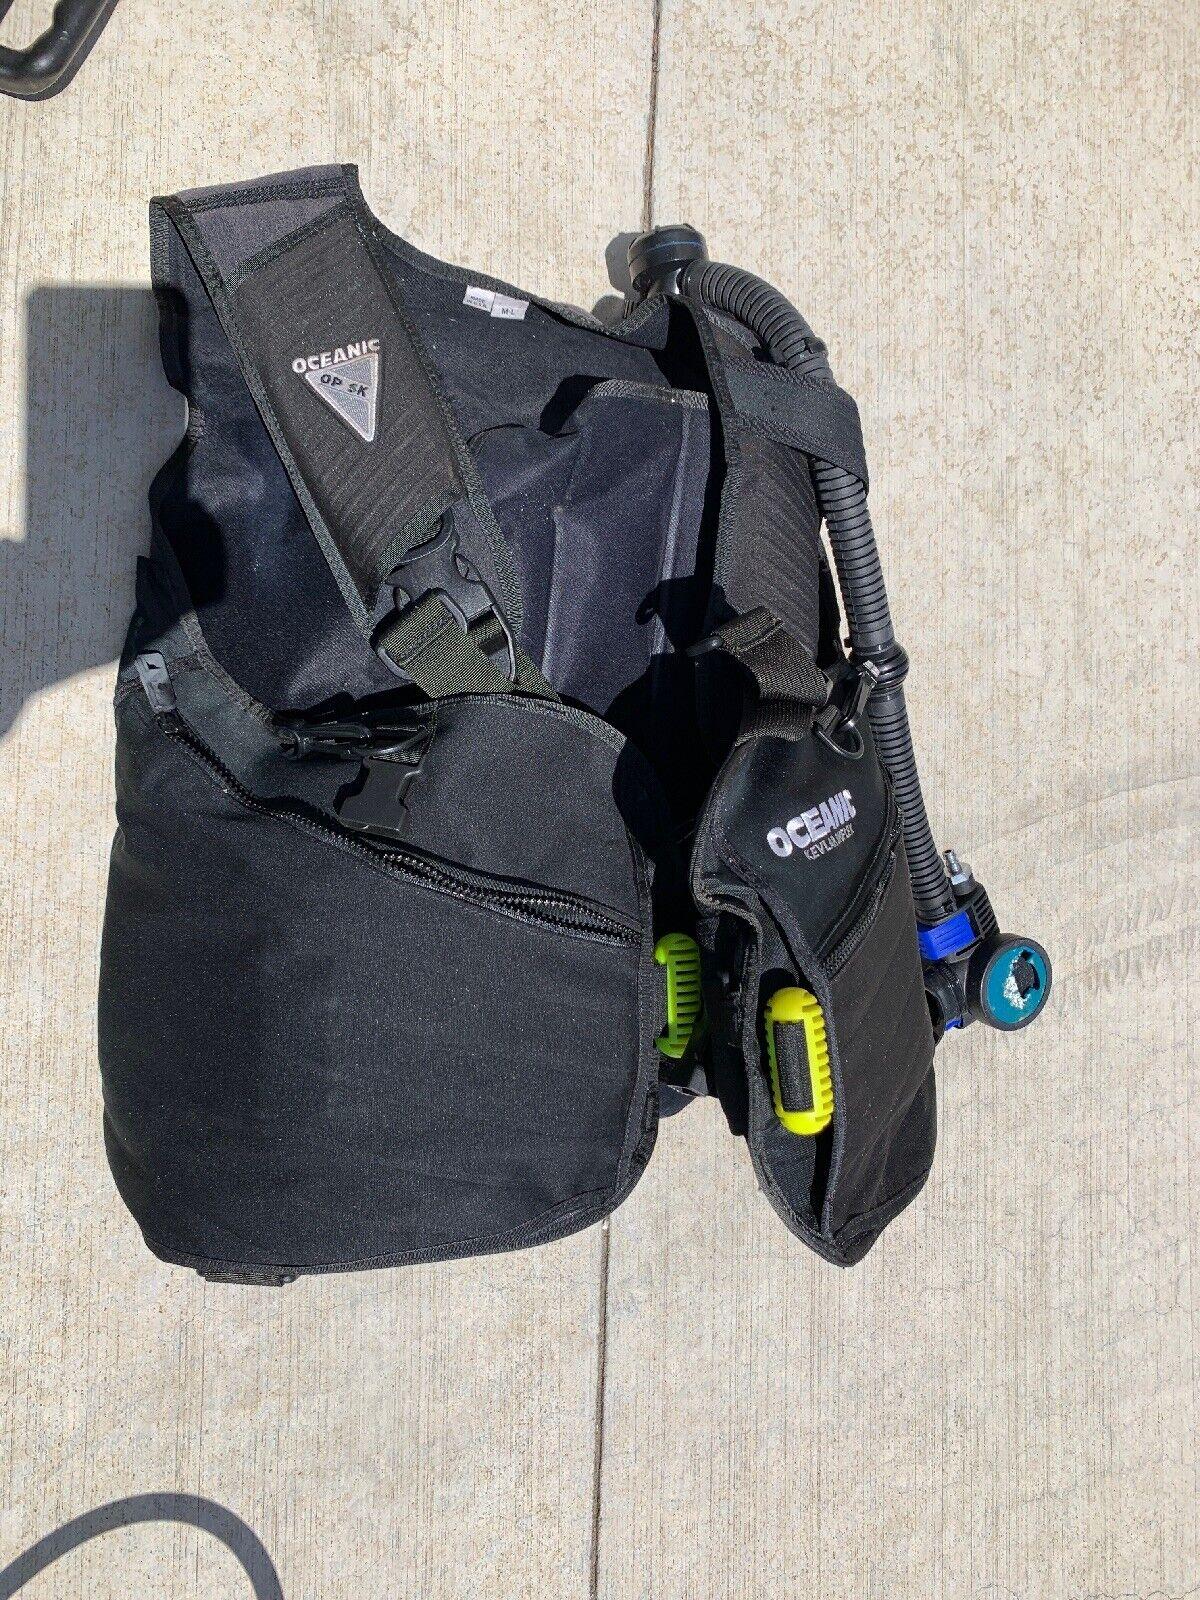 Oceanic OP5K Kevlar Bioflex BC Vest, Large Integrated Weights